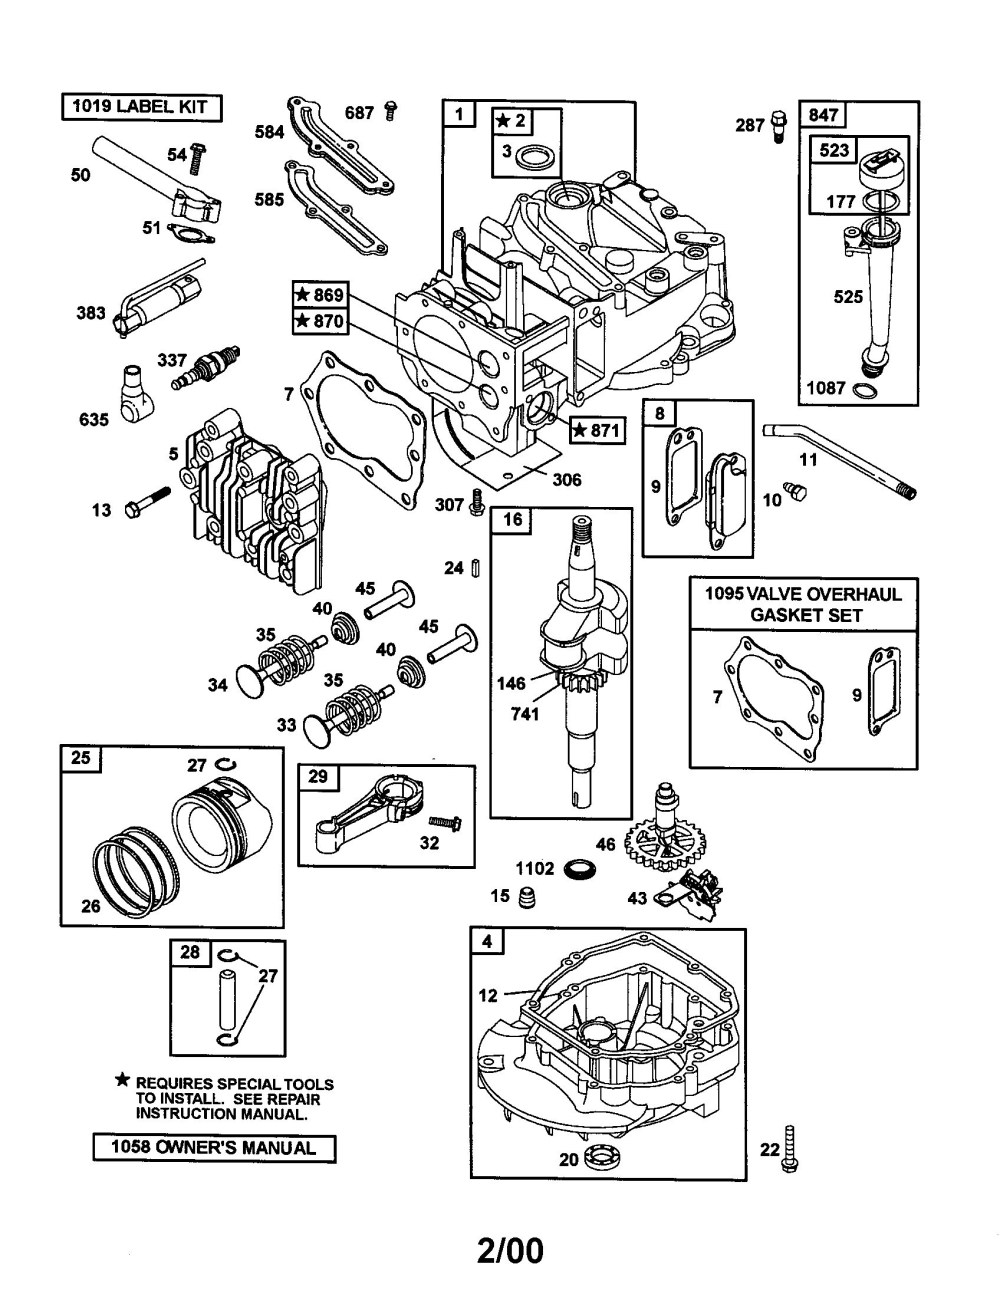 medium resolution of 1977 honda odyssey wiring diagram wiring diagramhonda odyssey atv diagram wiring diagram databasehonda helix wiring diagram